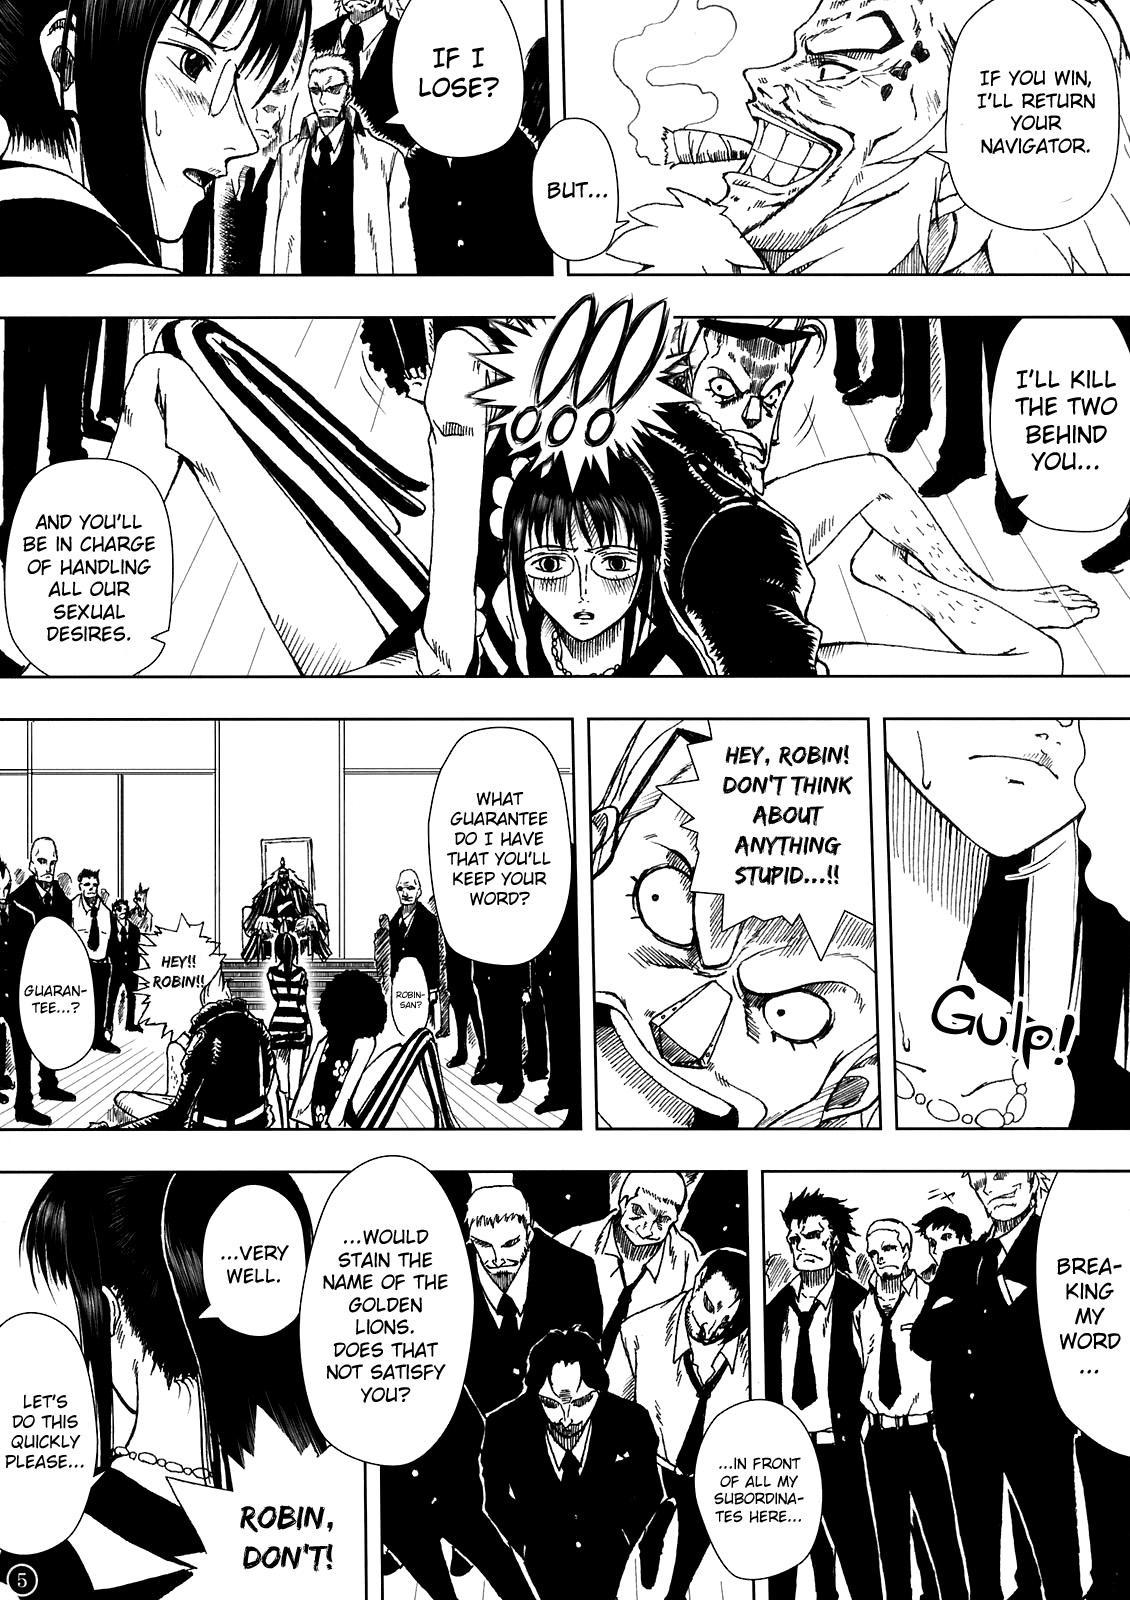 Akuma no Mi no Tsukaikata | The Use of Devil Fruits 5